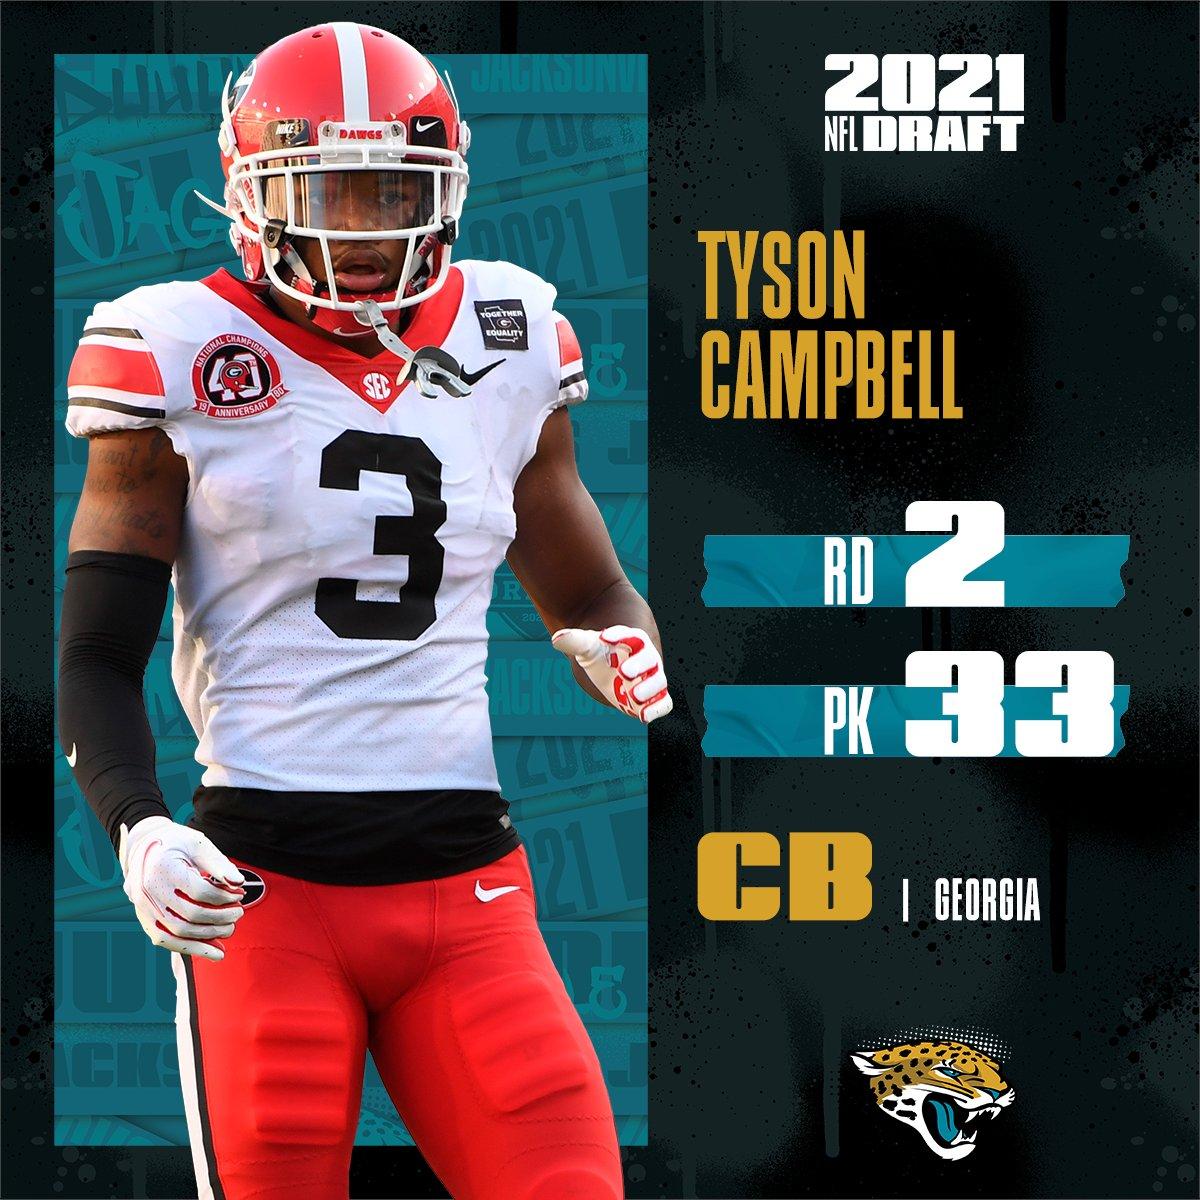 33-Jaguars-Campbell